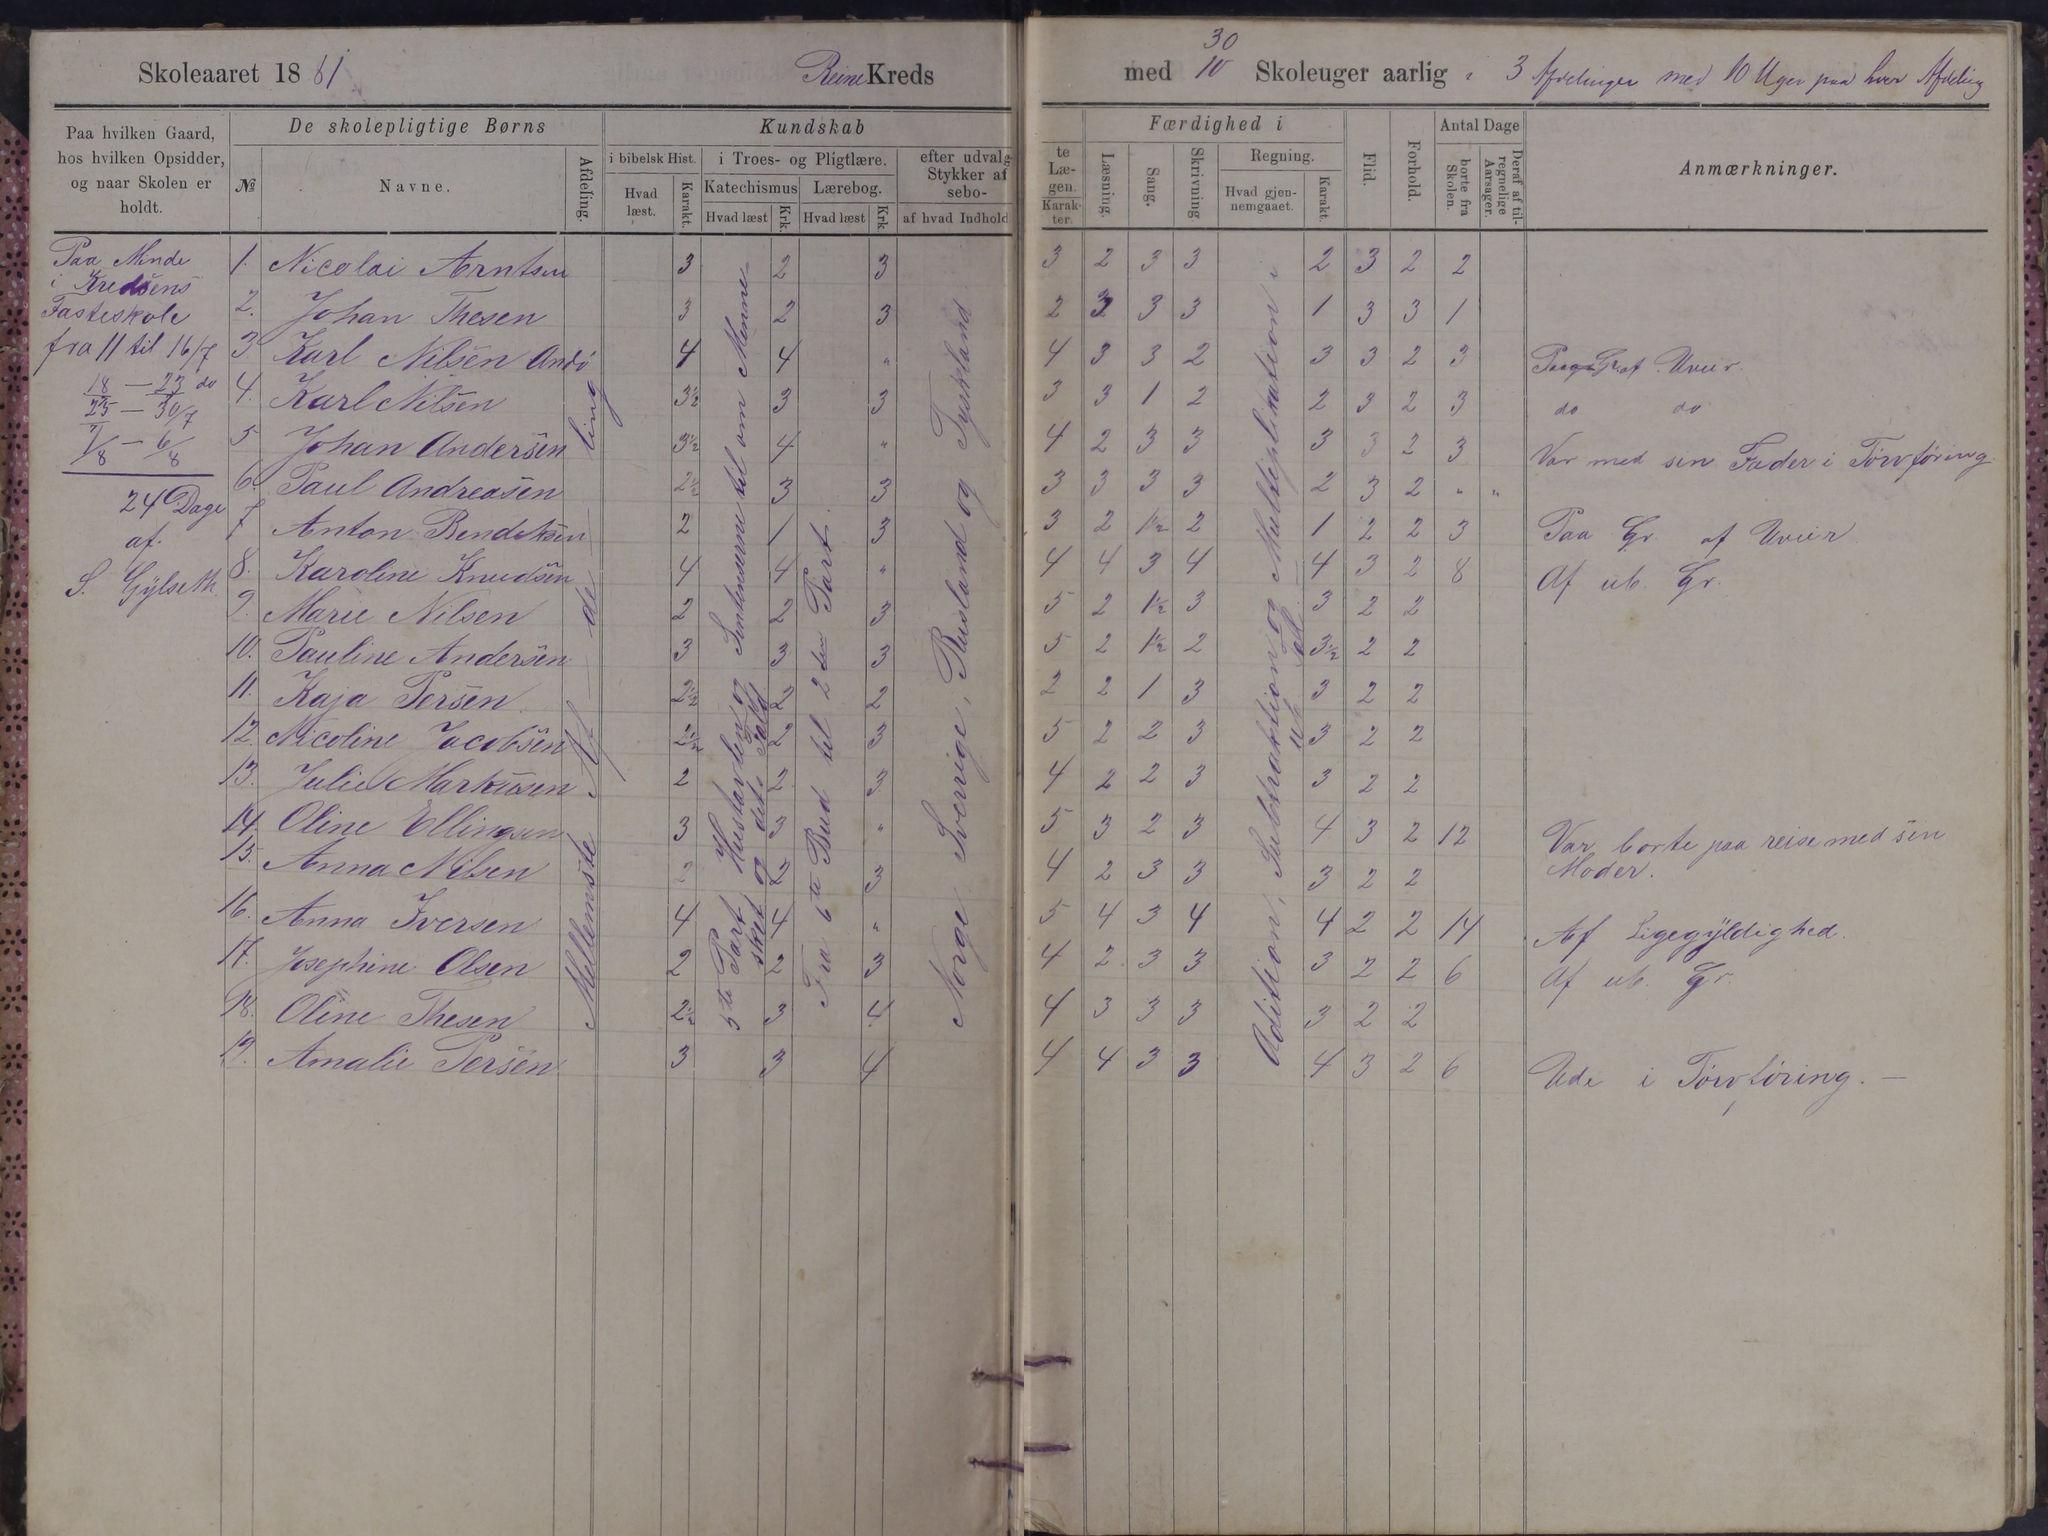 AIN, Moskenes kommune. Reine skolekrets, F/Fb/L0001: Karakterprotokoll, 1881-1891